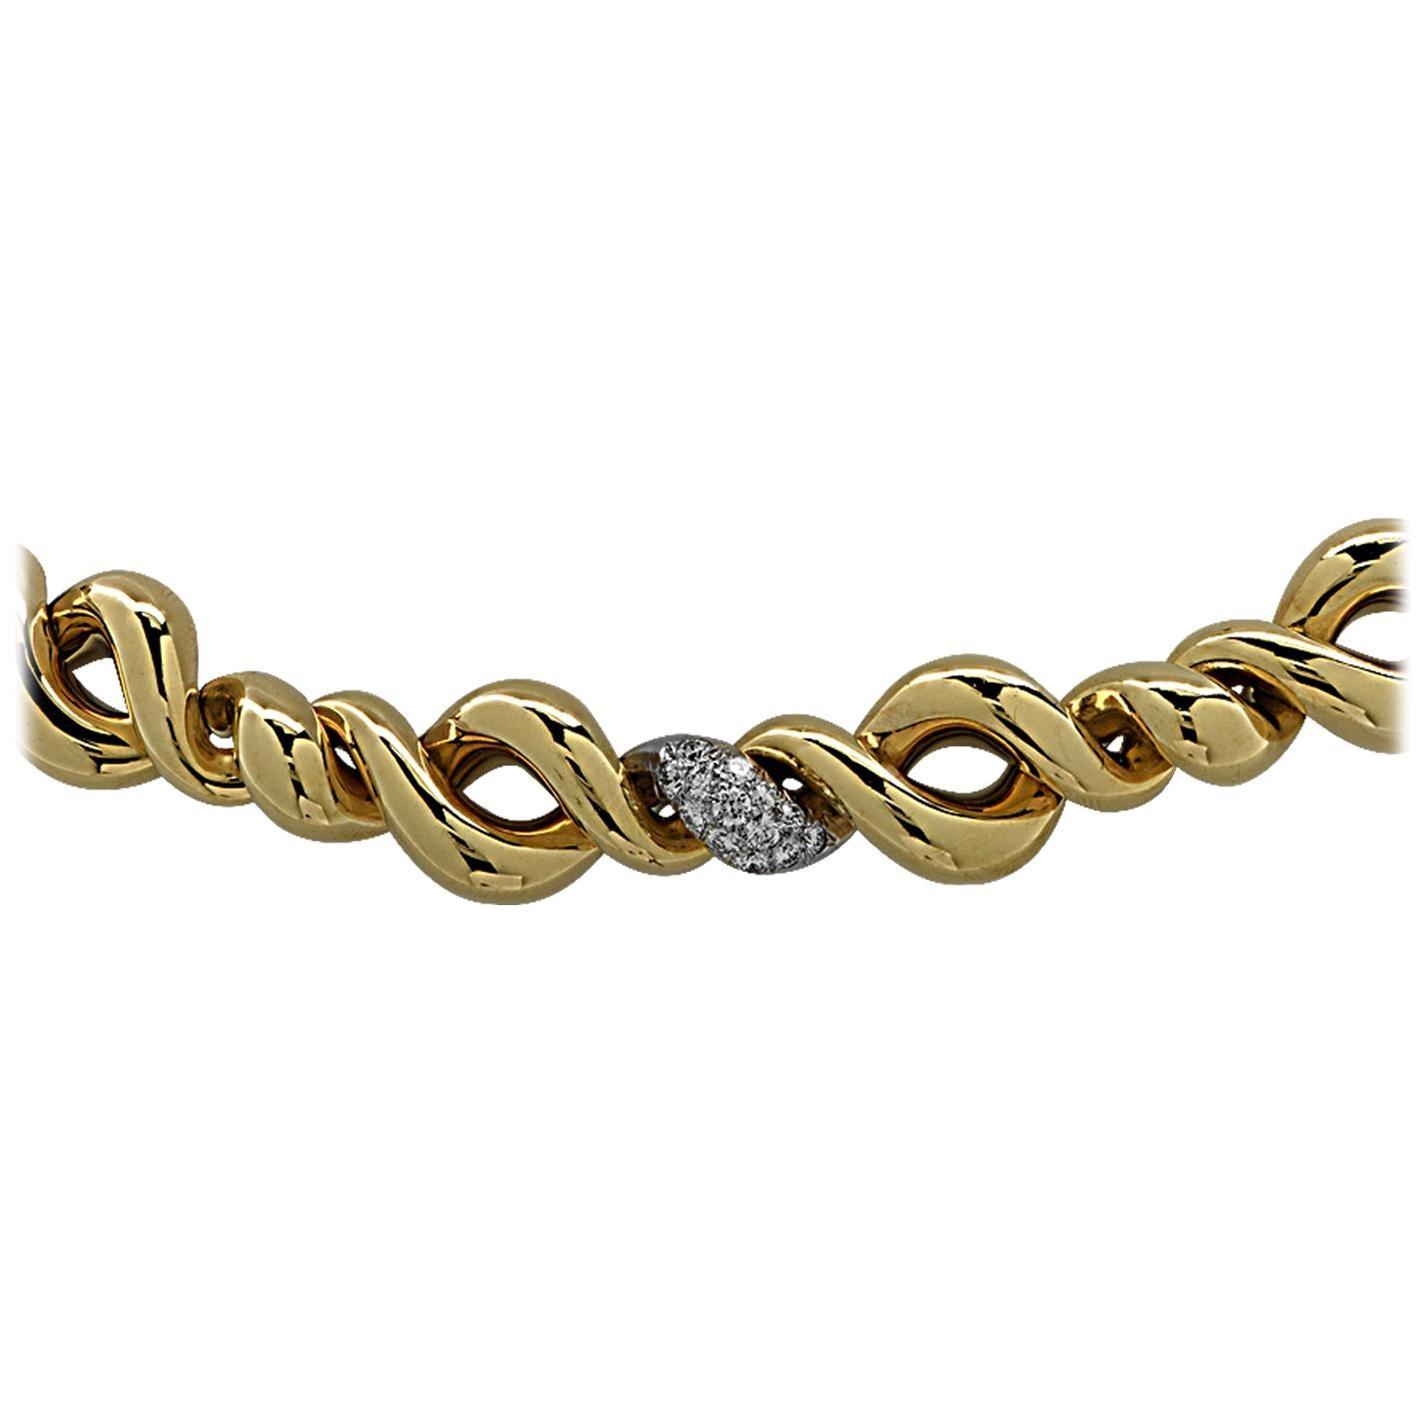 Italian Two-Tone 18 Karat Gold and Diamond Necklace